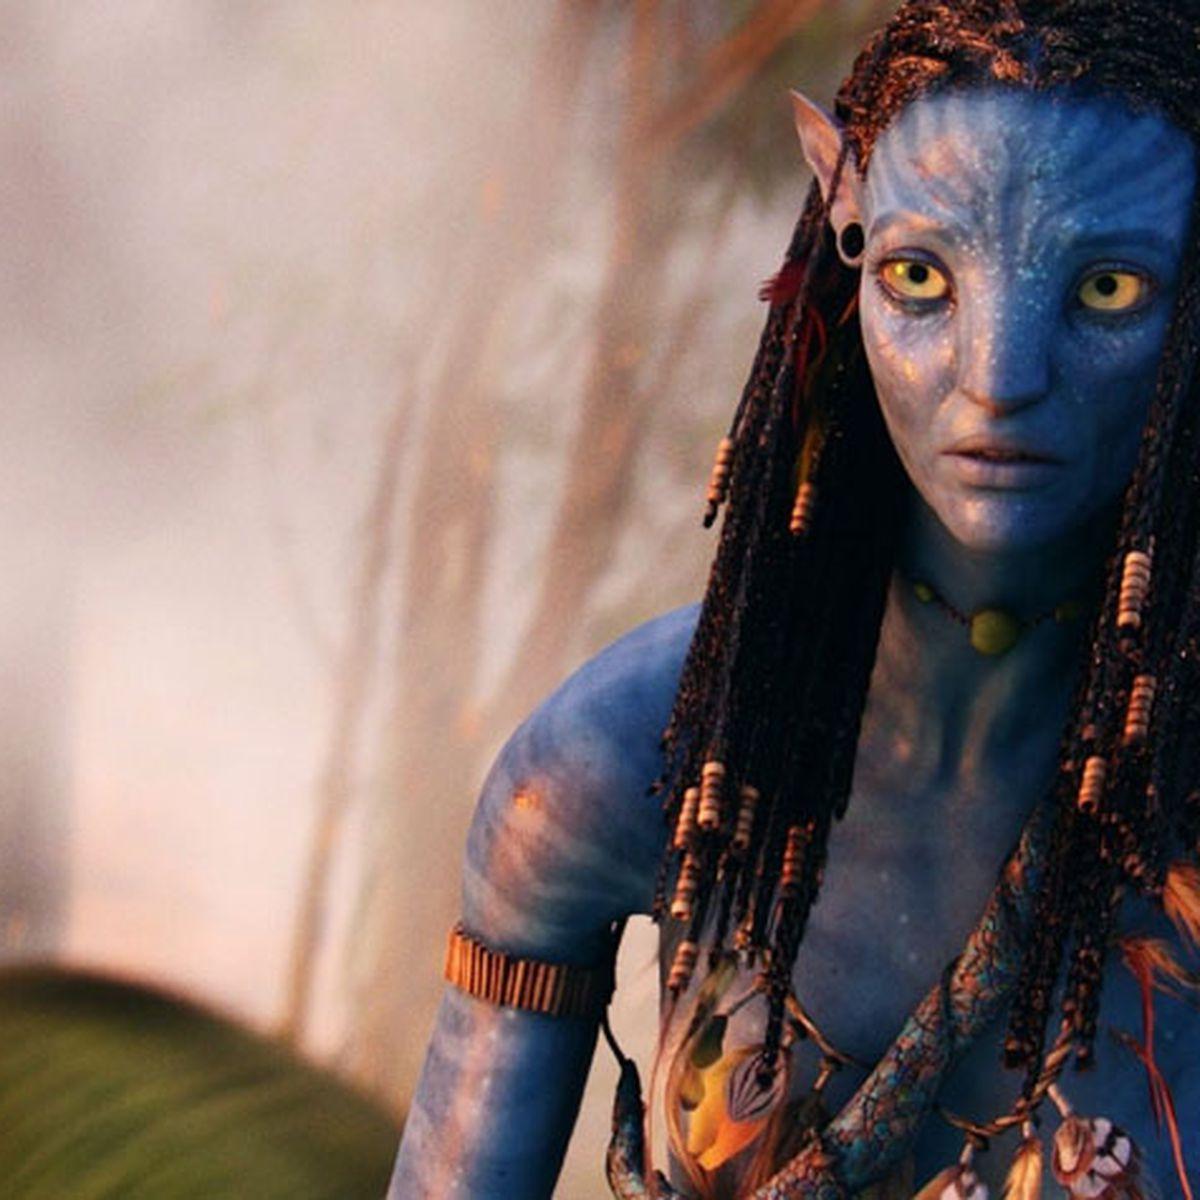 Avatar Porno Pelicula avatar 2: fecha de estreno, tráiler, sinopsis e historia